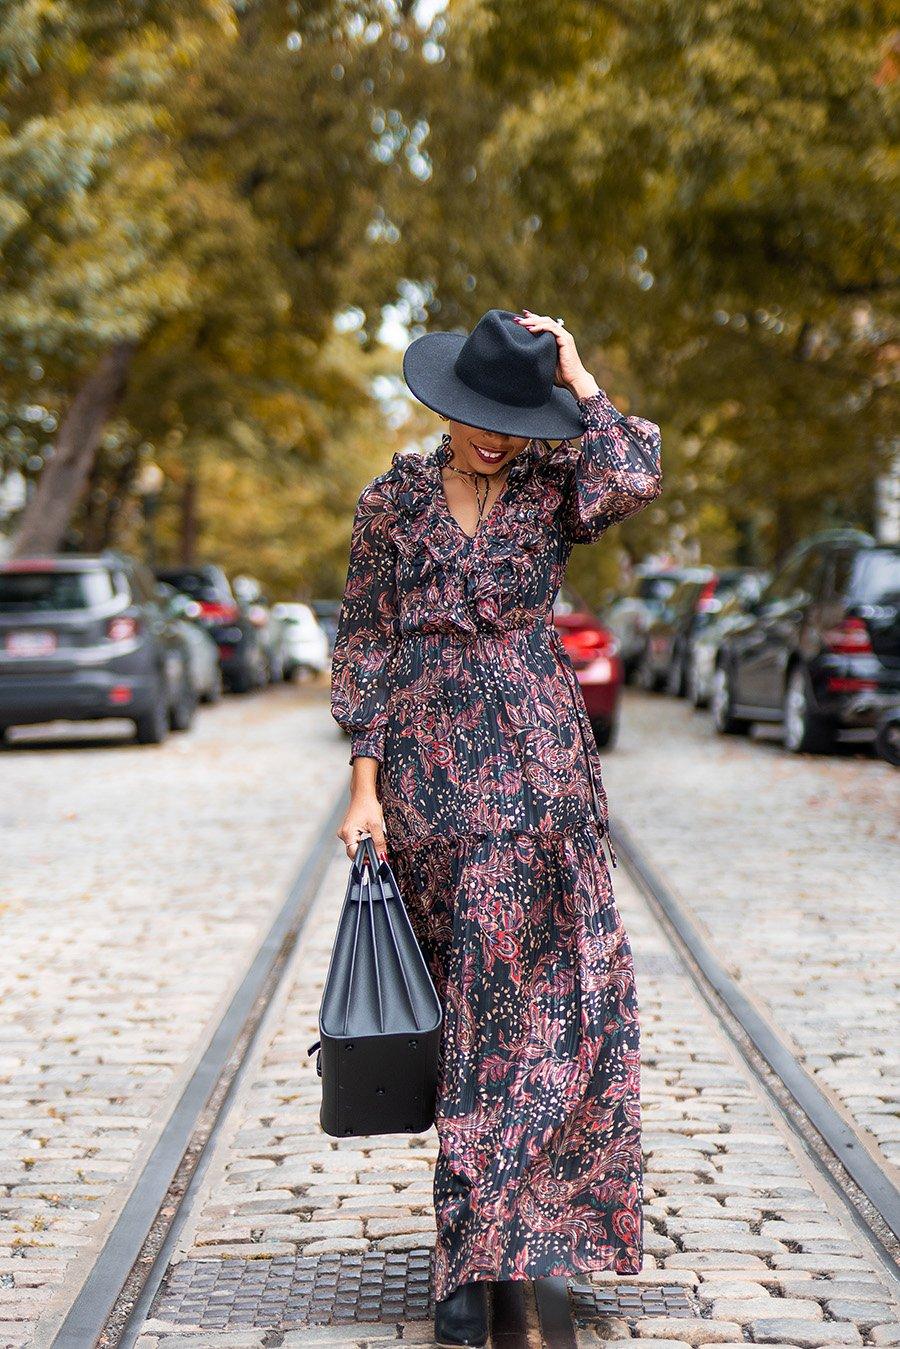 stella-adewunmi-of-jadore-fashion-blog-shares-mango-print-maxi-dress-for-fall